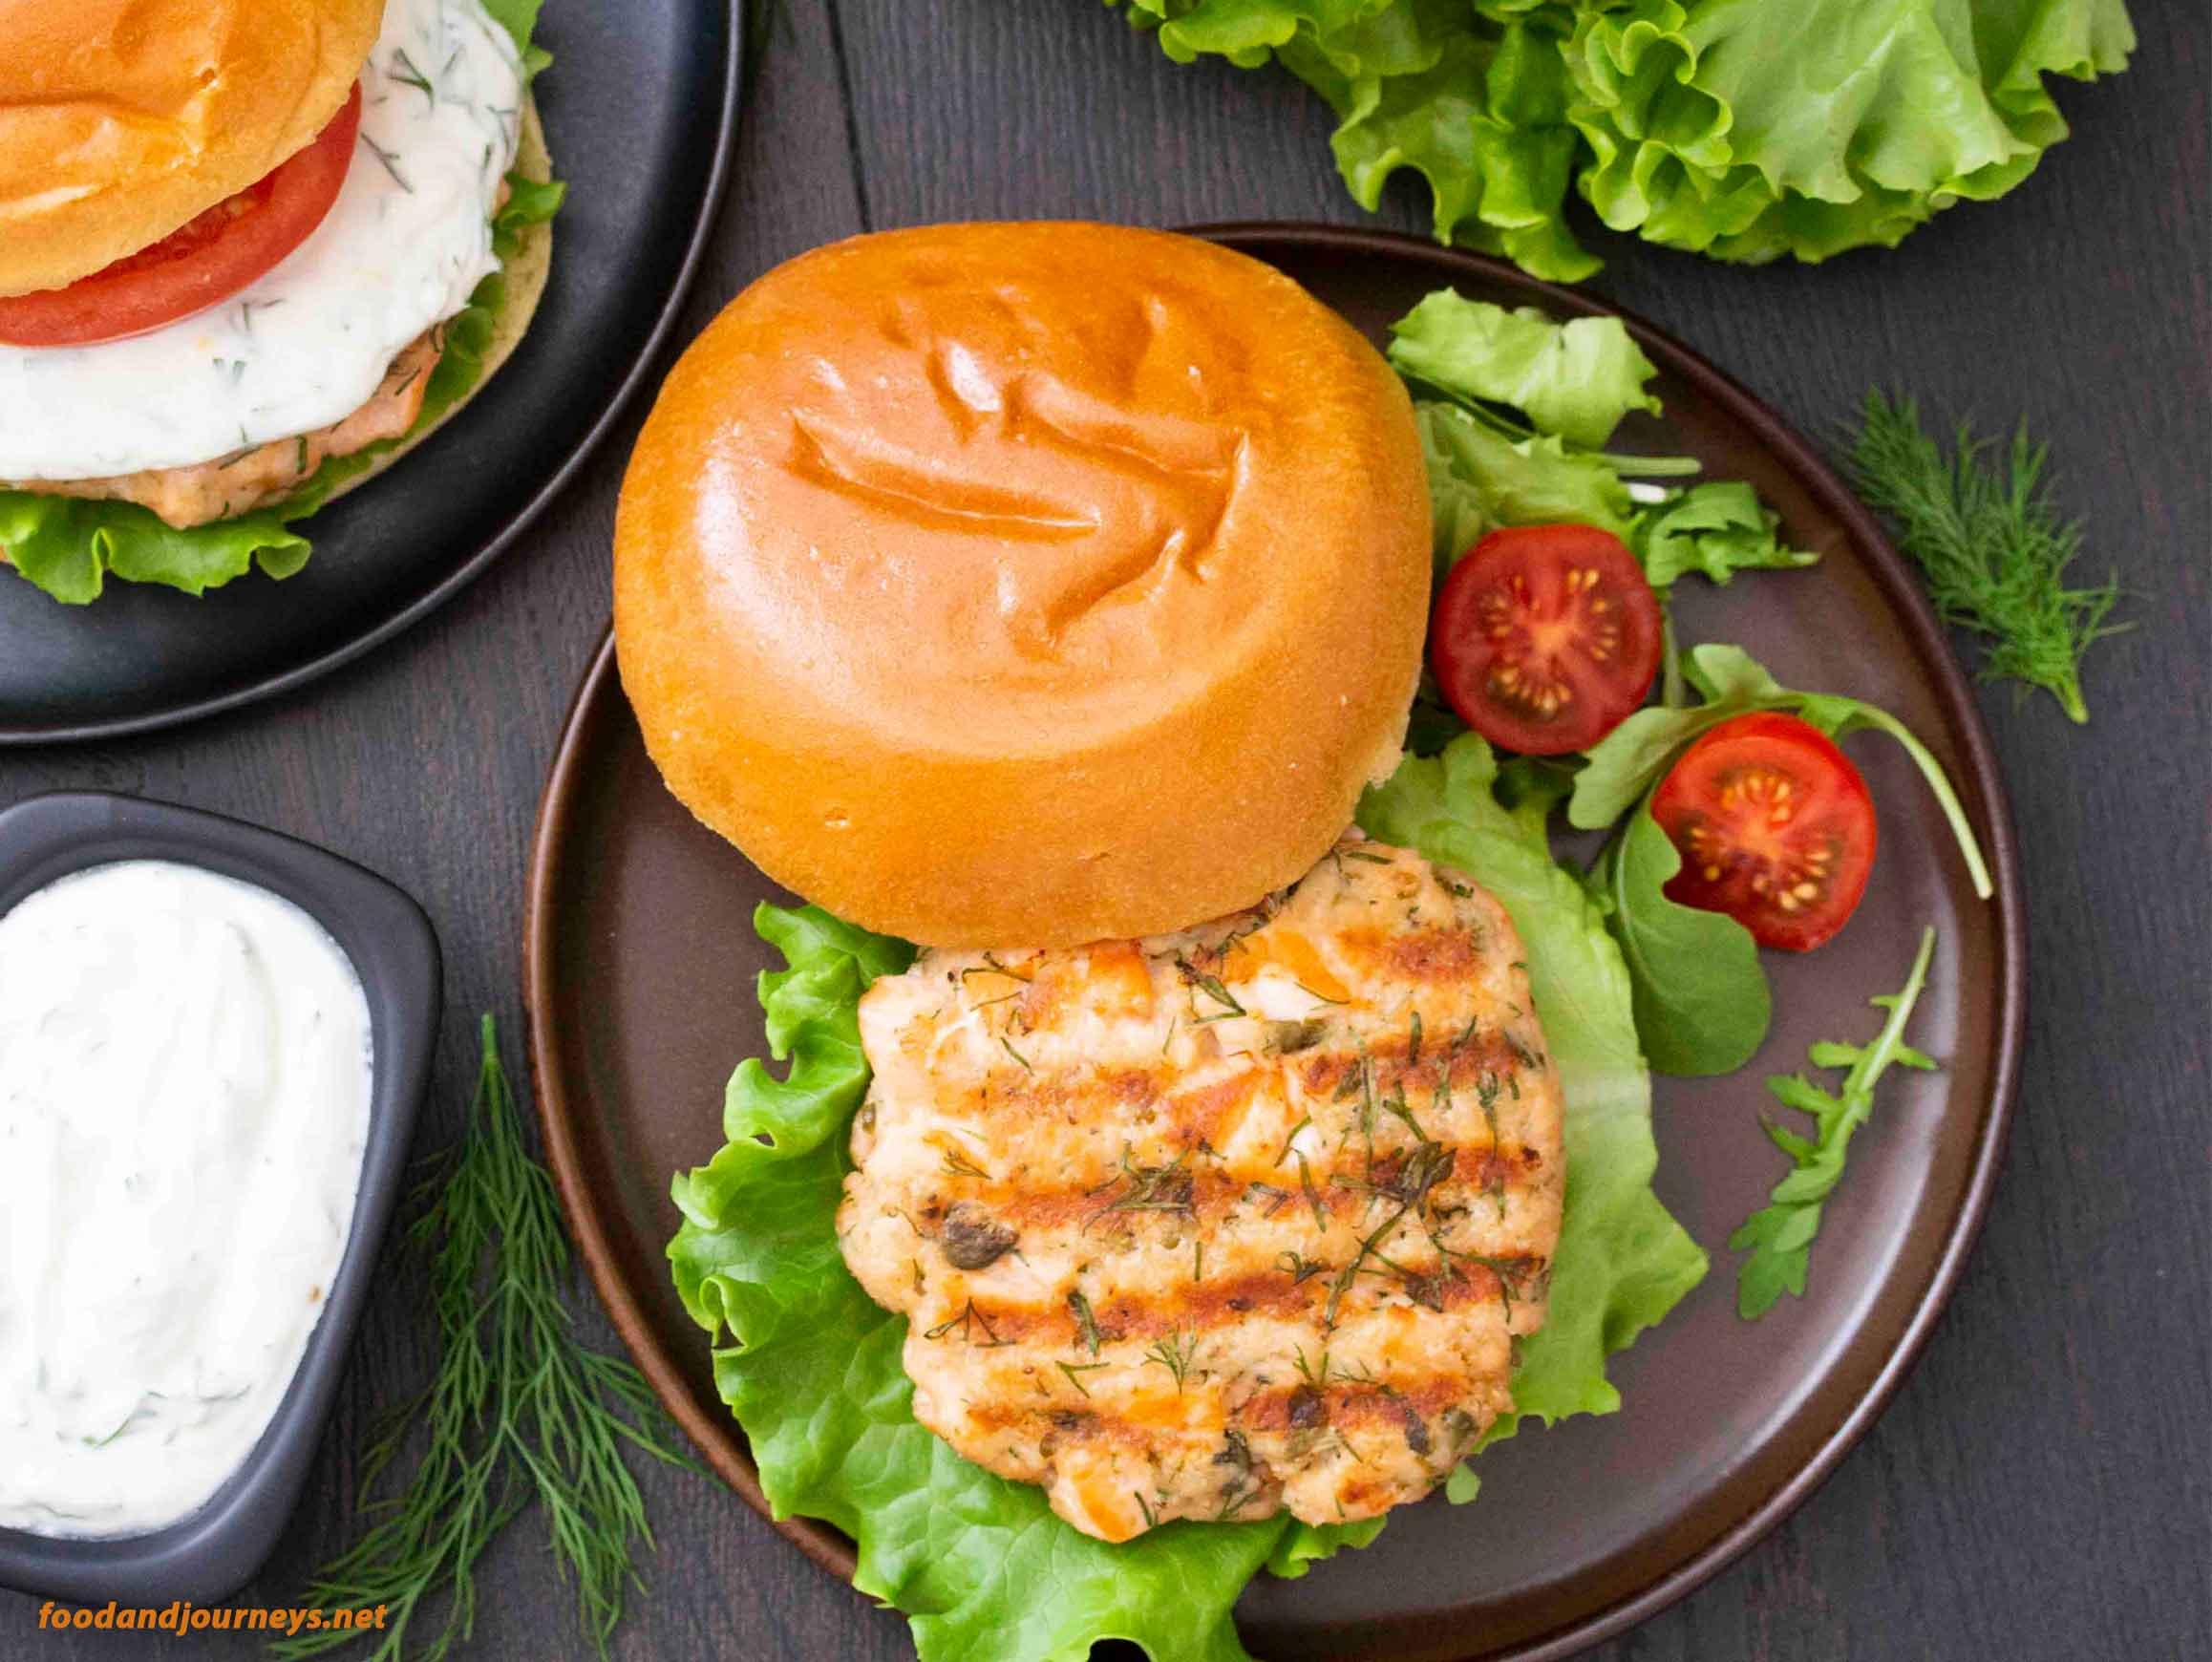 Overhead shot of Swedish Salmon Burger with Lemon Yogurt Sauce on the side.